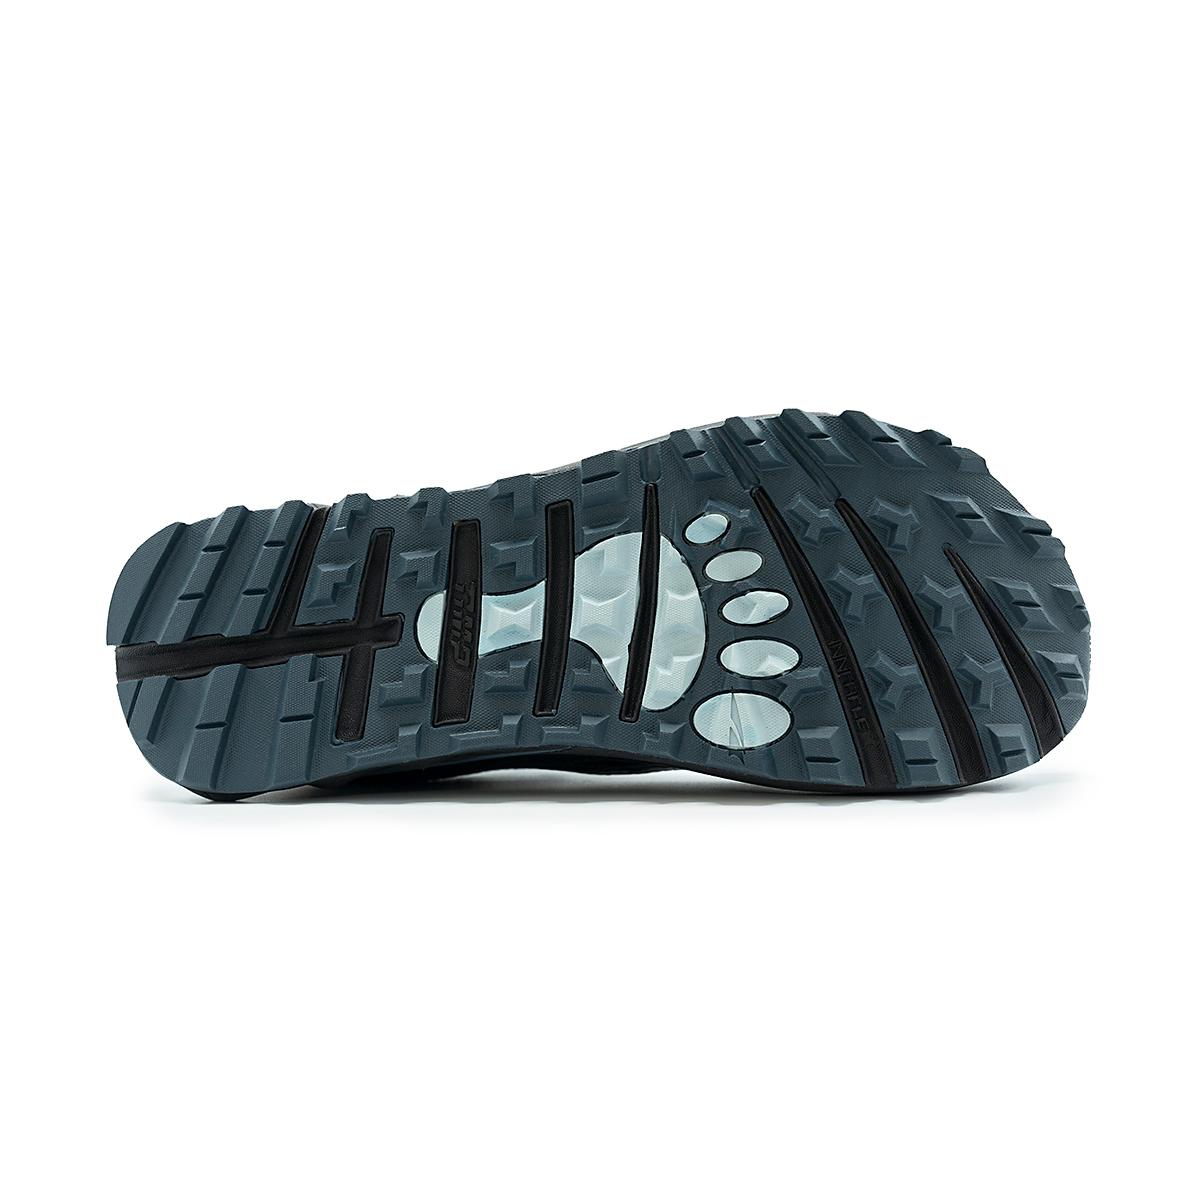 Women's Altra Timp 2 Running Shoe - Color: Black/Gray - Size: 5.5 - Width: Regular, Black/Gray, large, image 4